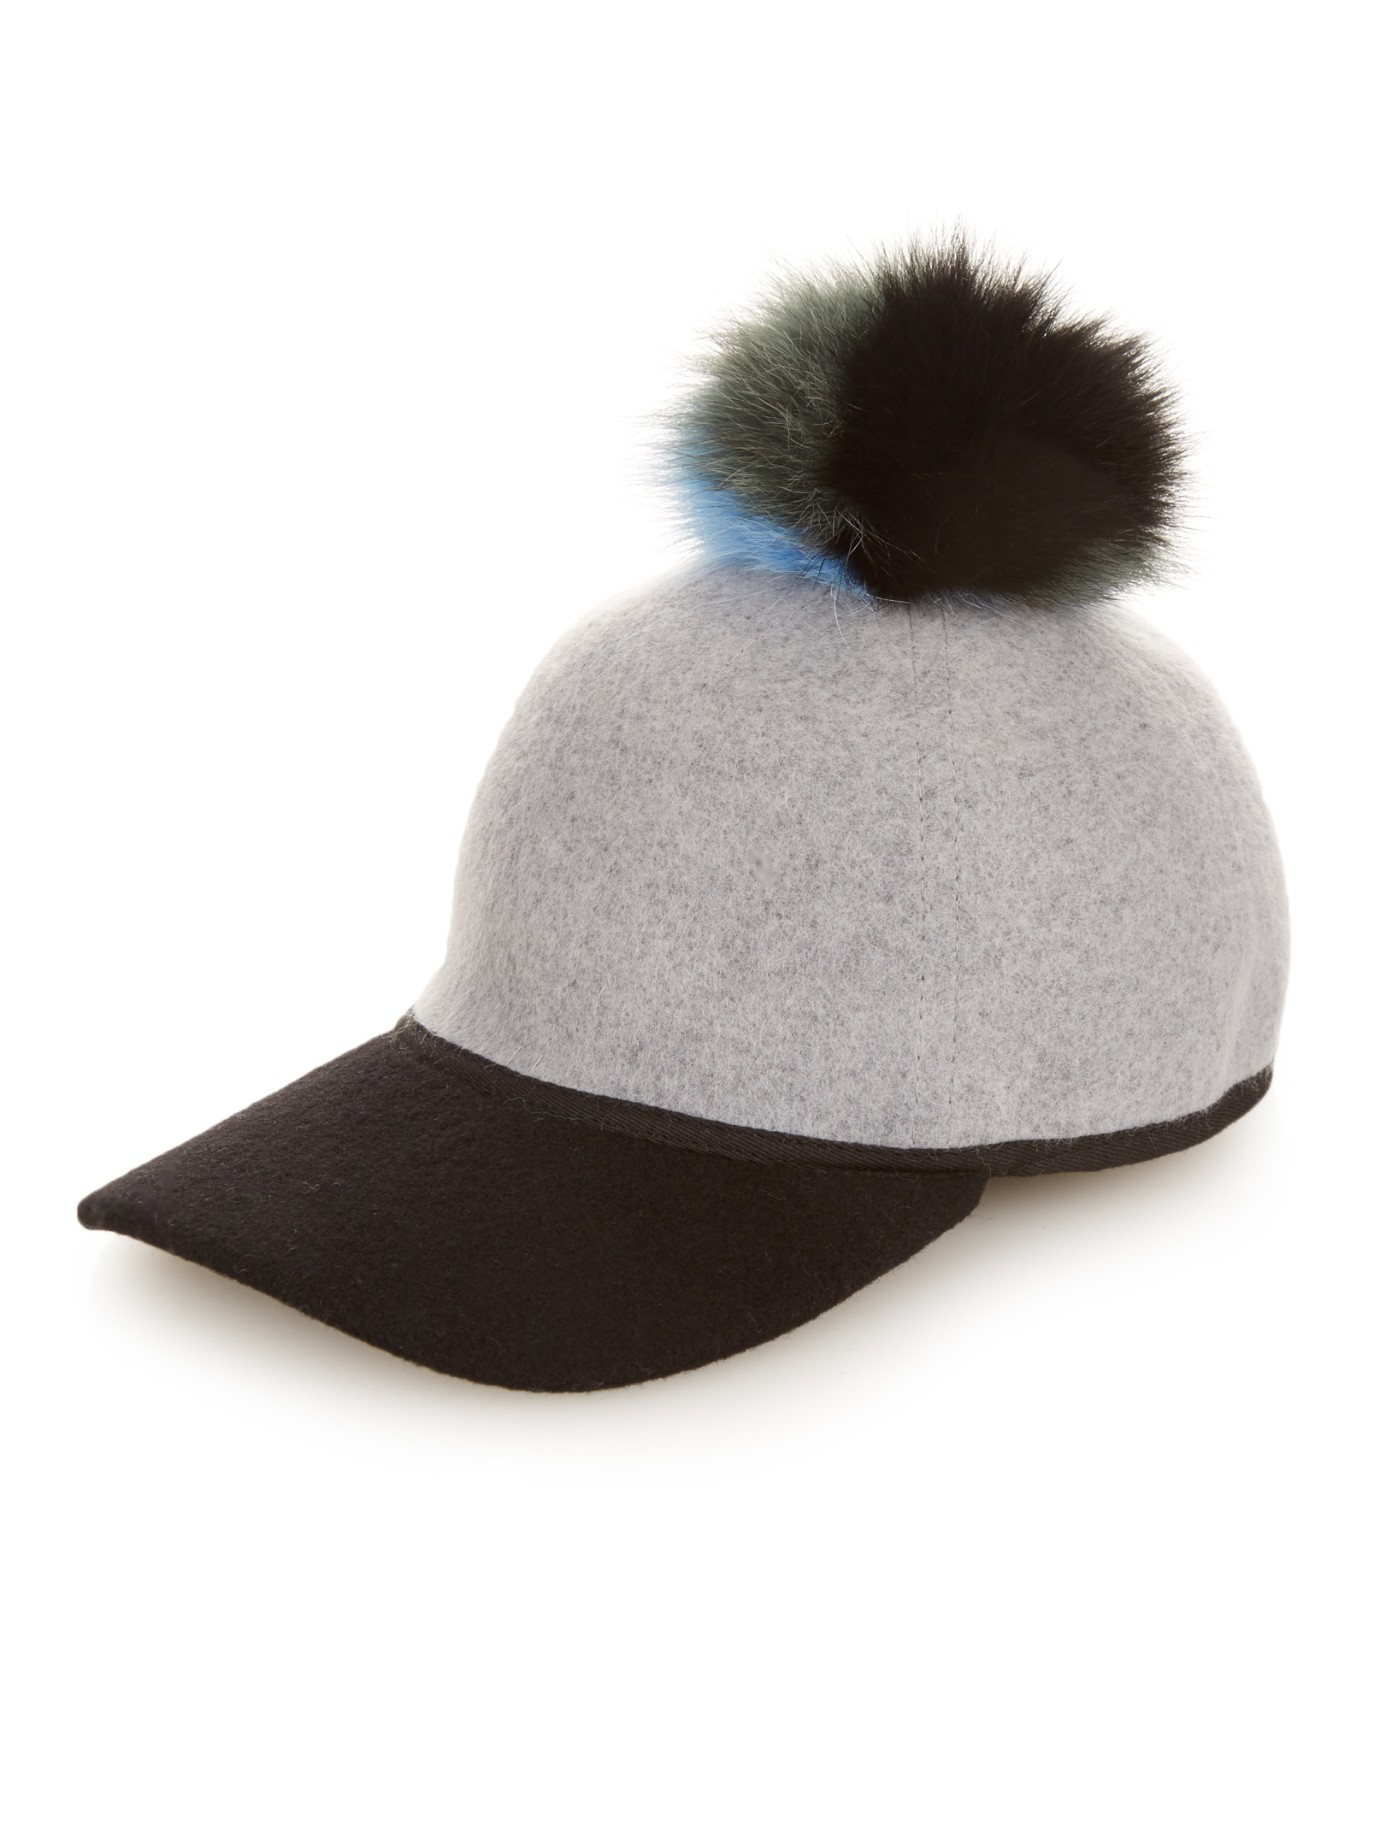 bca25ddc509 Charlotte Simone Sass Fox-fur Pompom Cap in Gray - Lyst